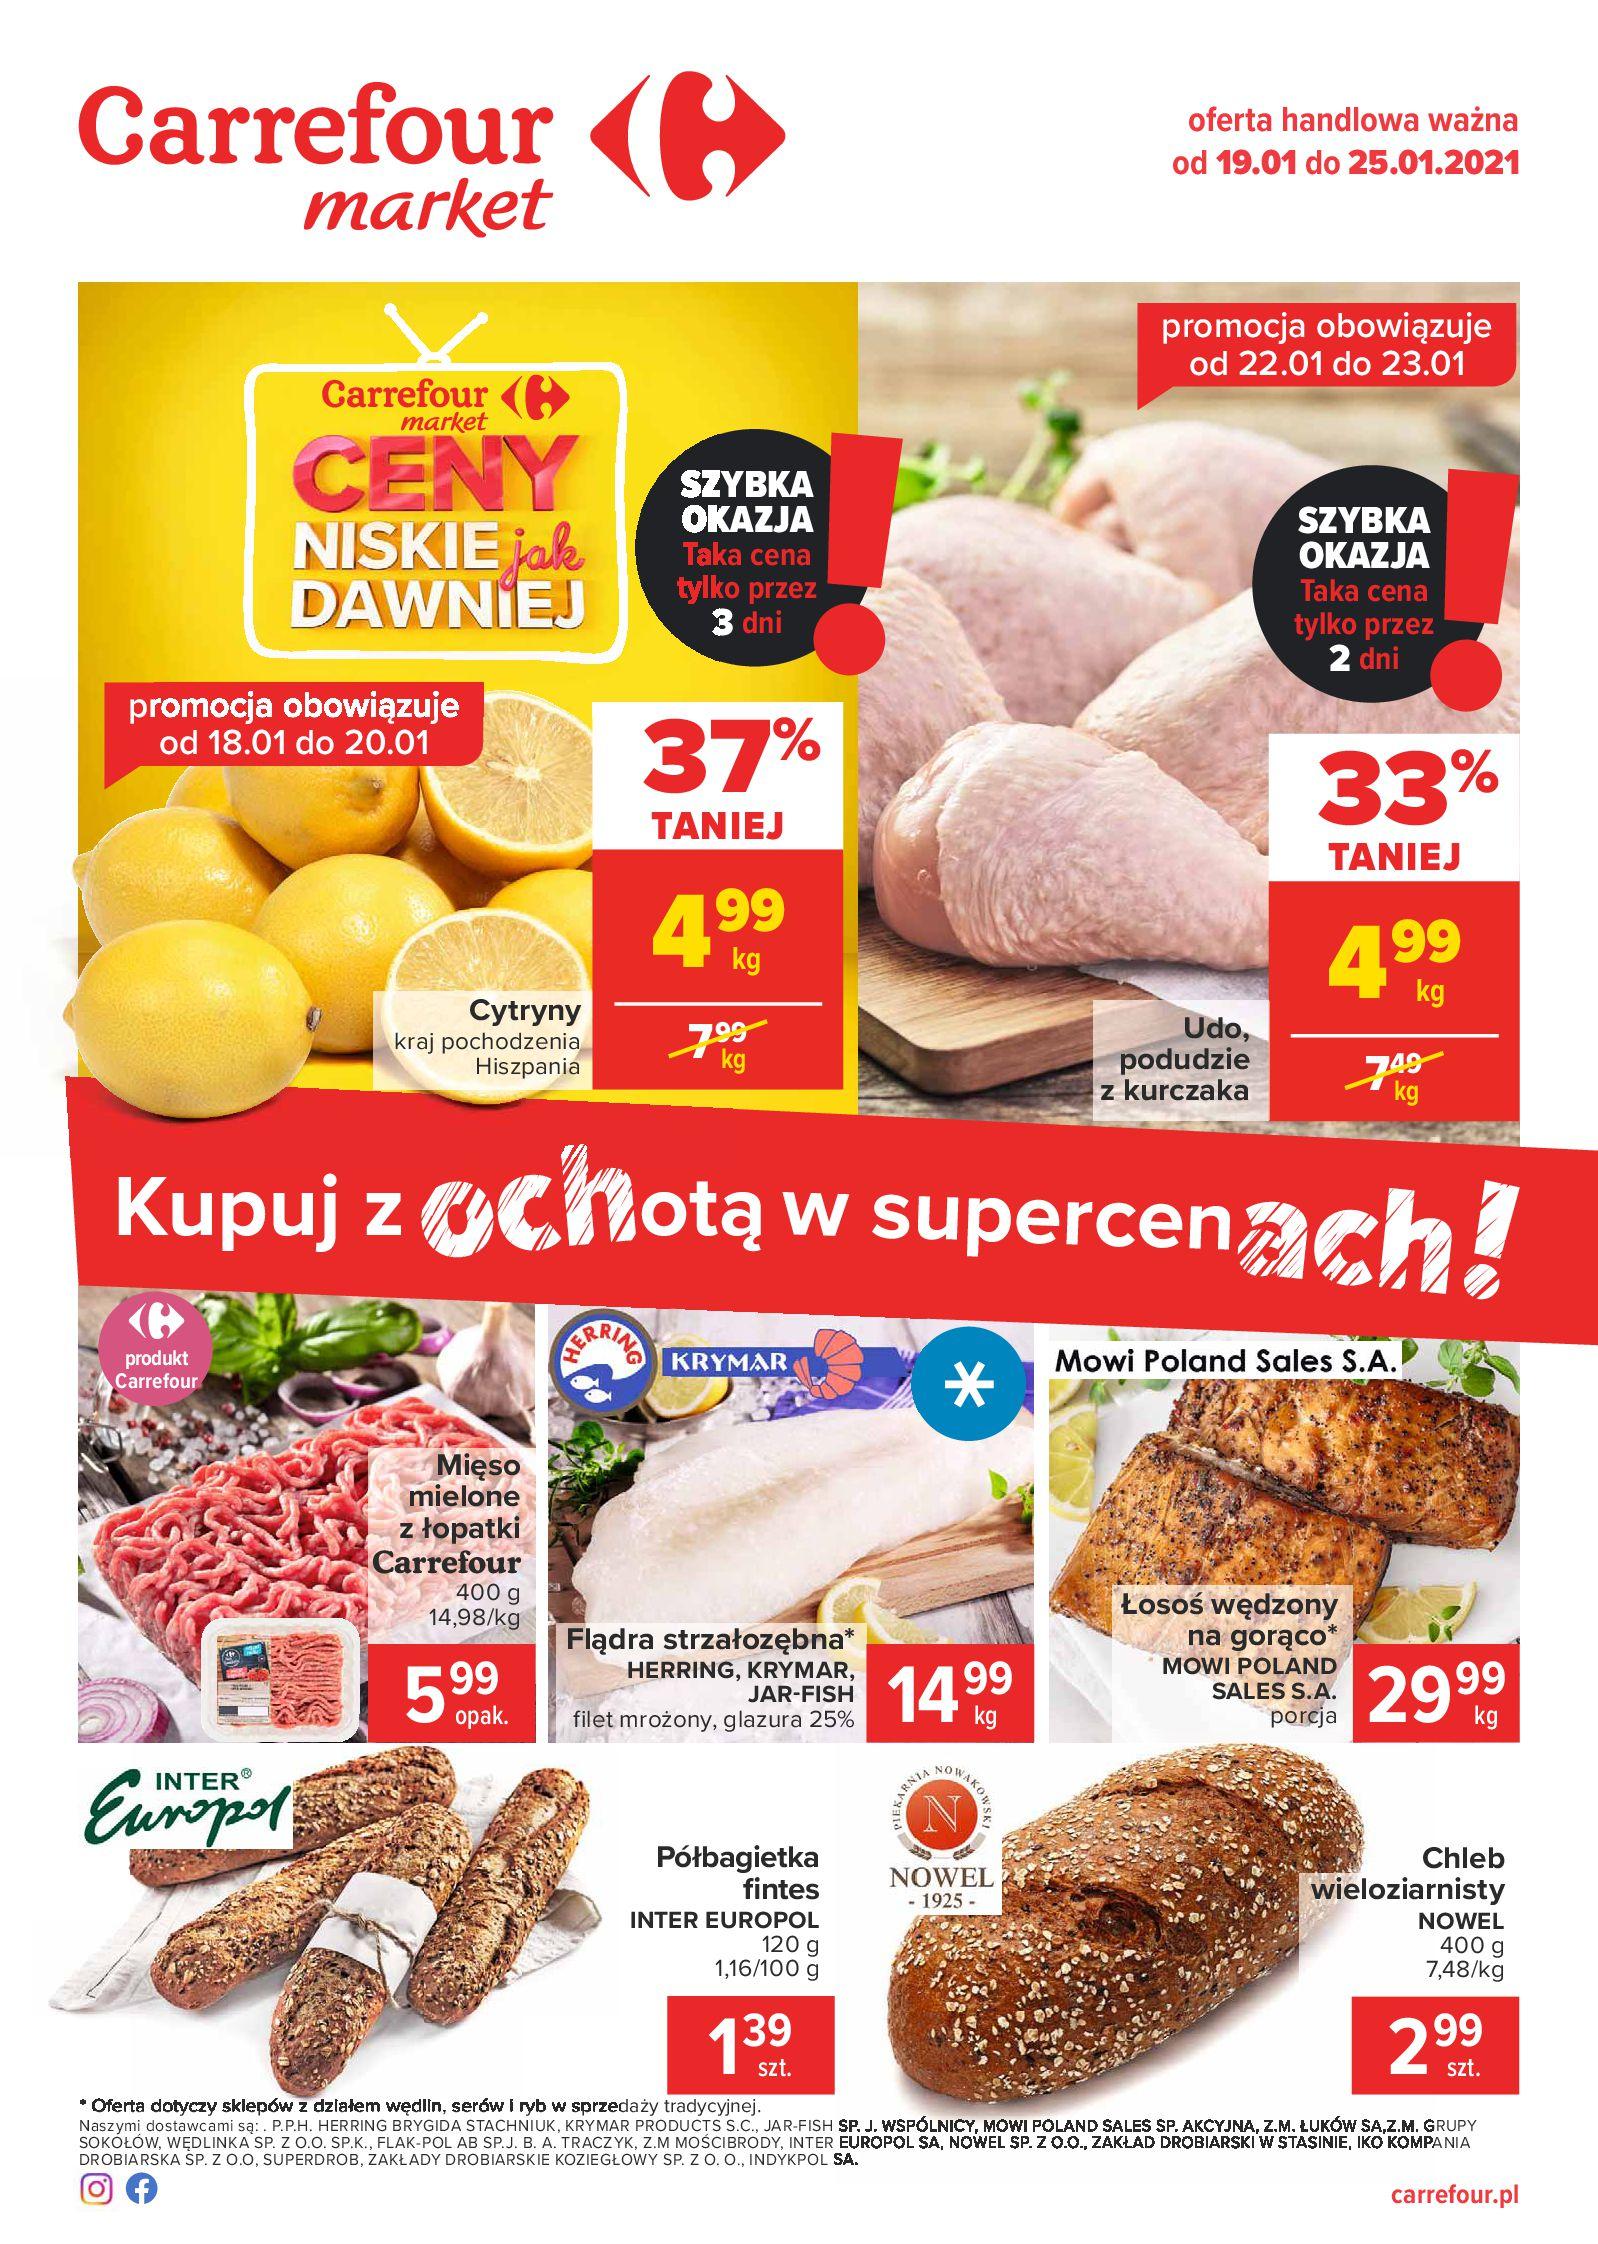 Carrefour Market:  Gazetka Market 18.01.2021